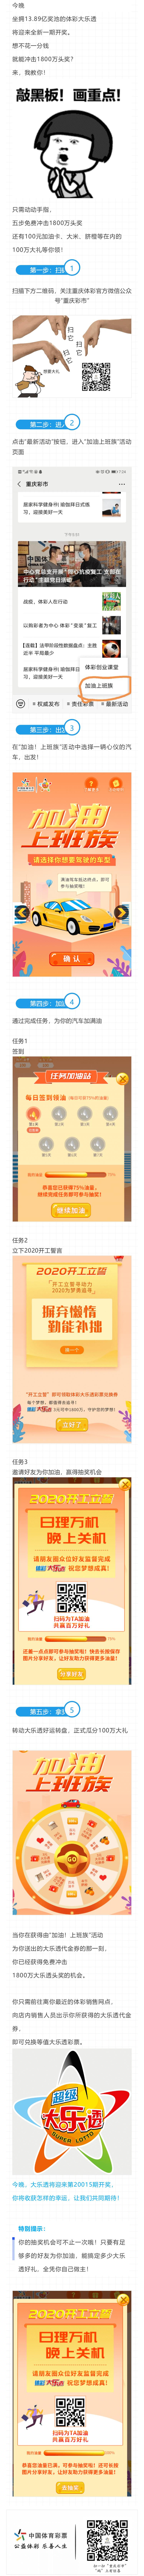 20200328_1440_yiban_screenshot.png